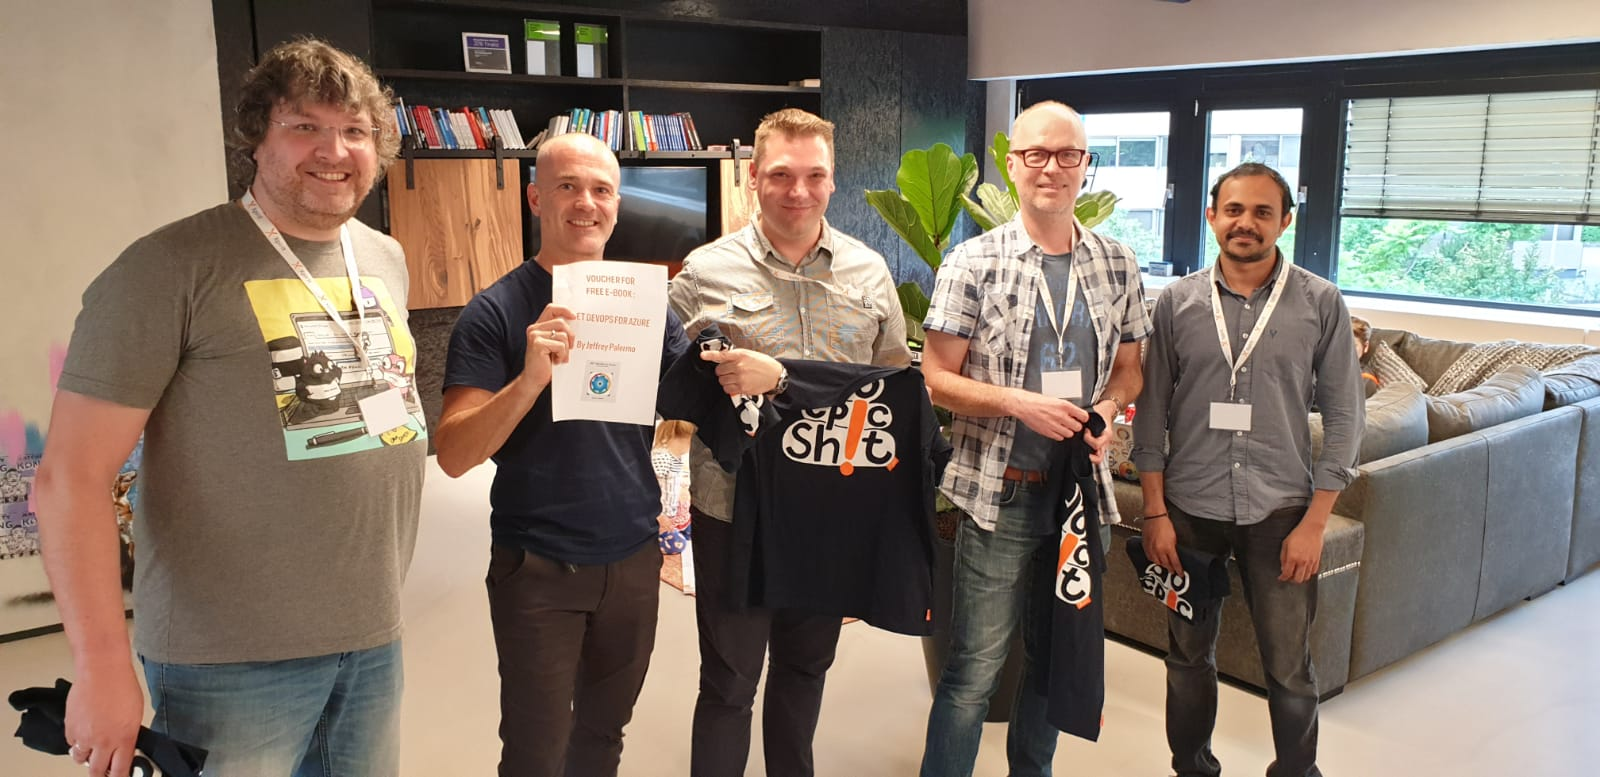 GDBC 2019 Xpirit Hilversum Winning Team